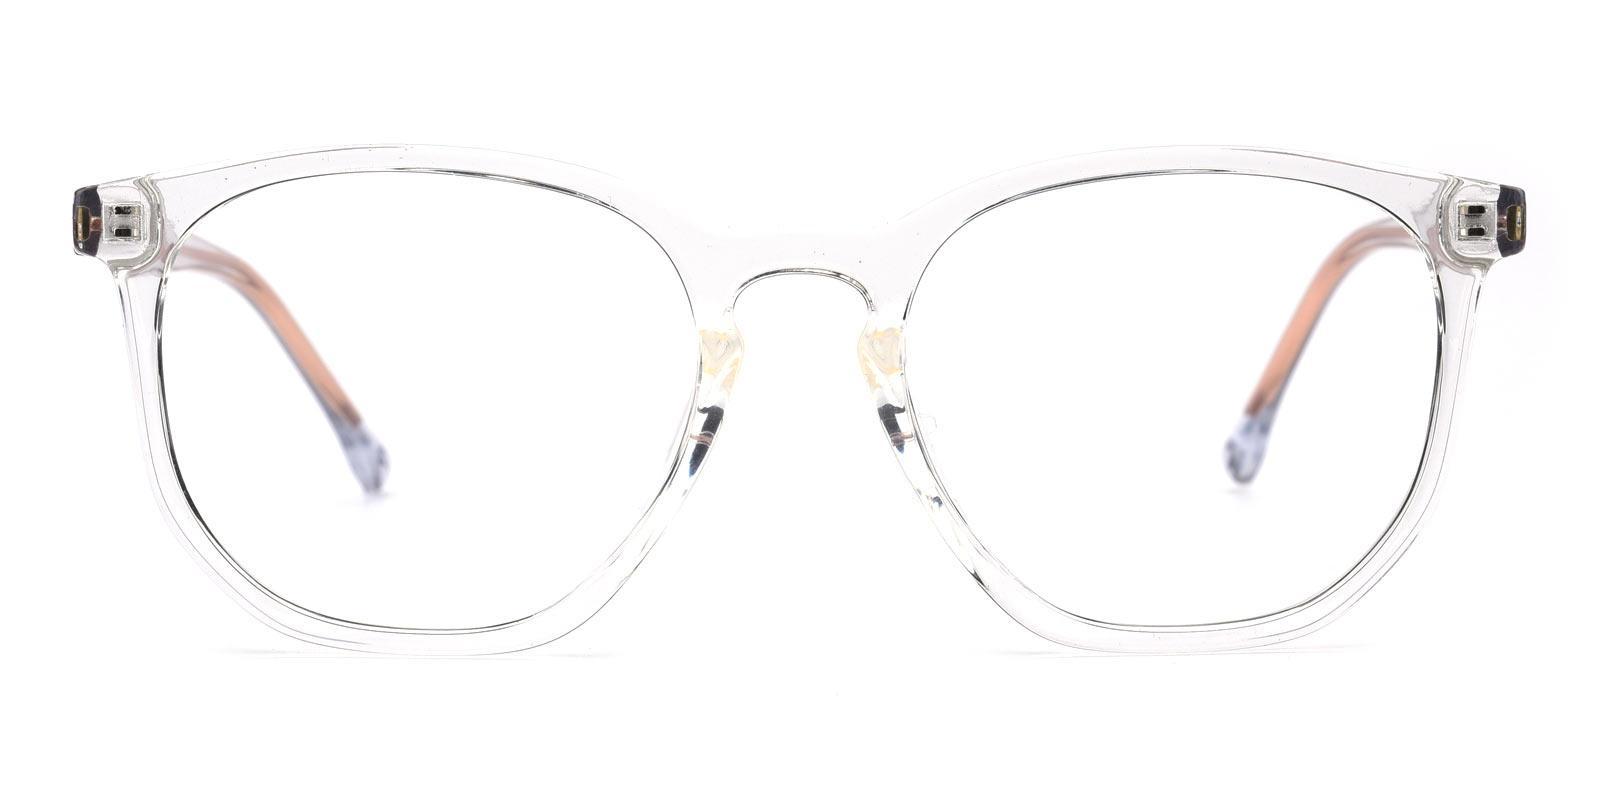 Dominique-Translucent-Geometric-TR-Eyeglasses-detail